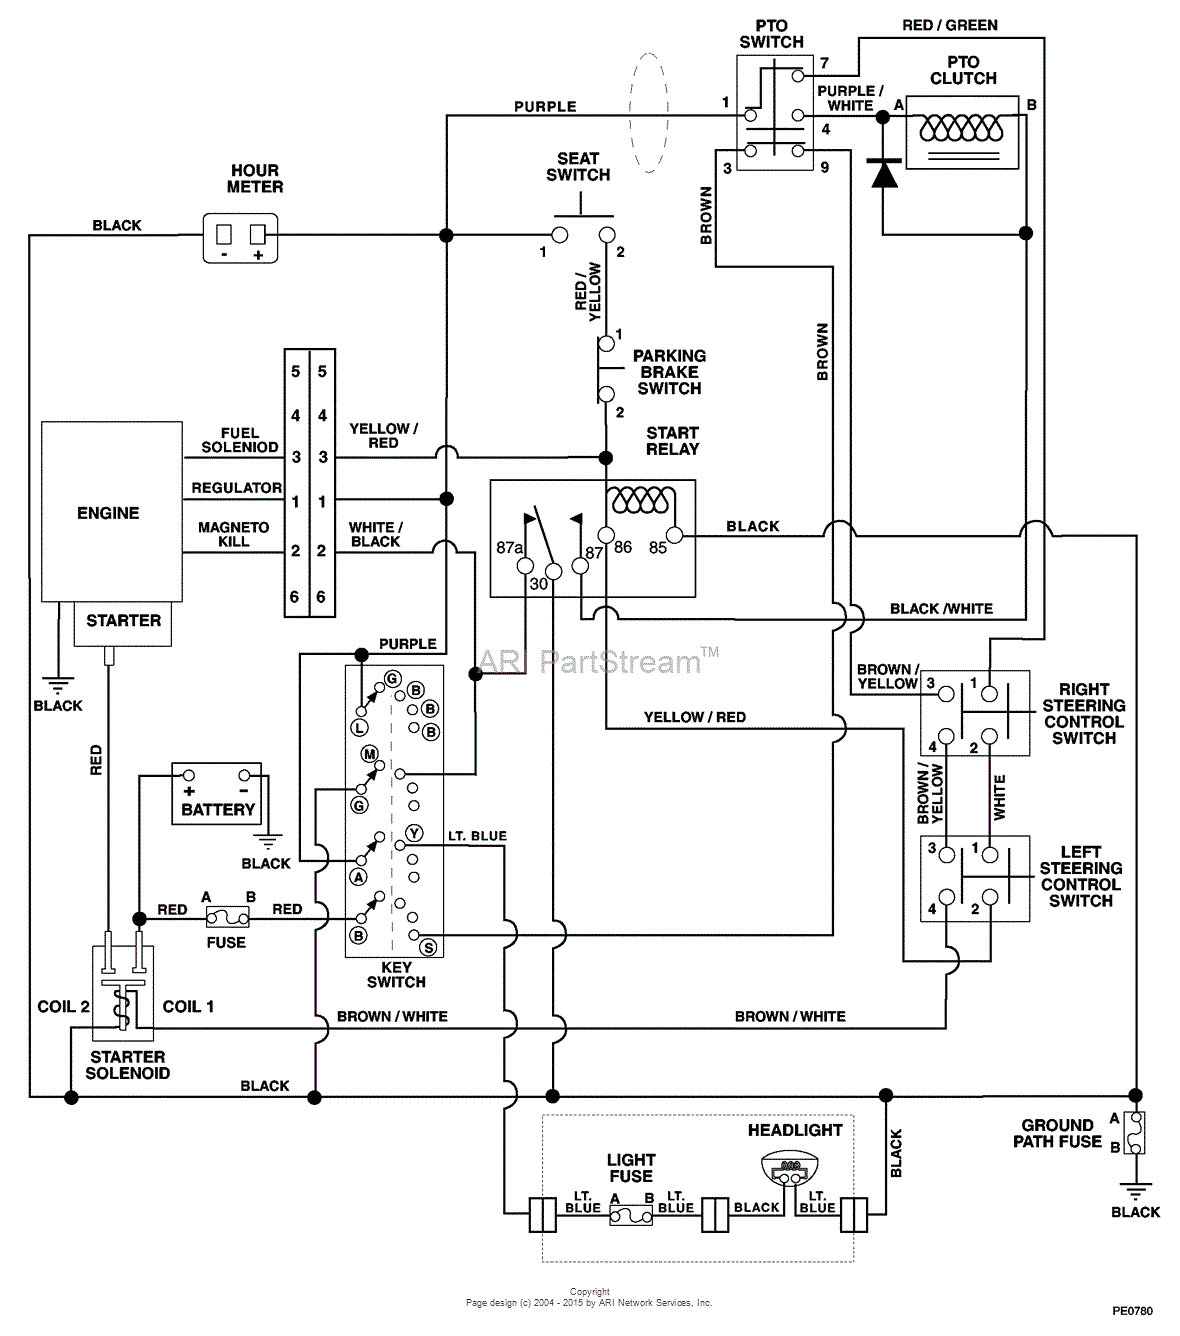 bunn wiring diagram book diagram schema bunn model bx wiring diagram